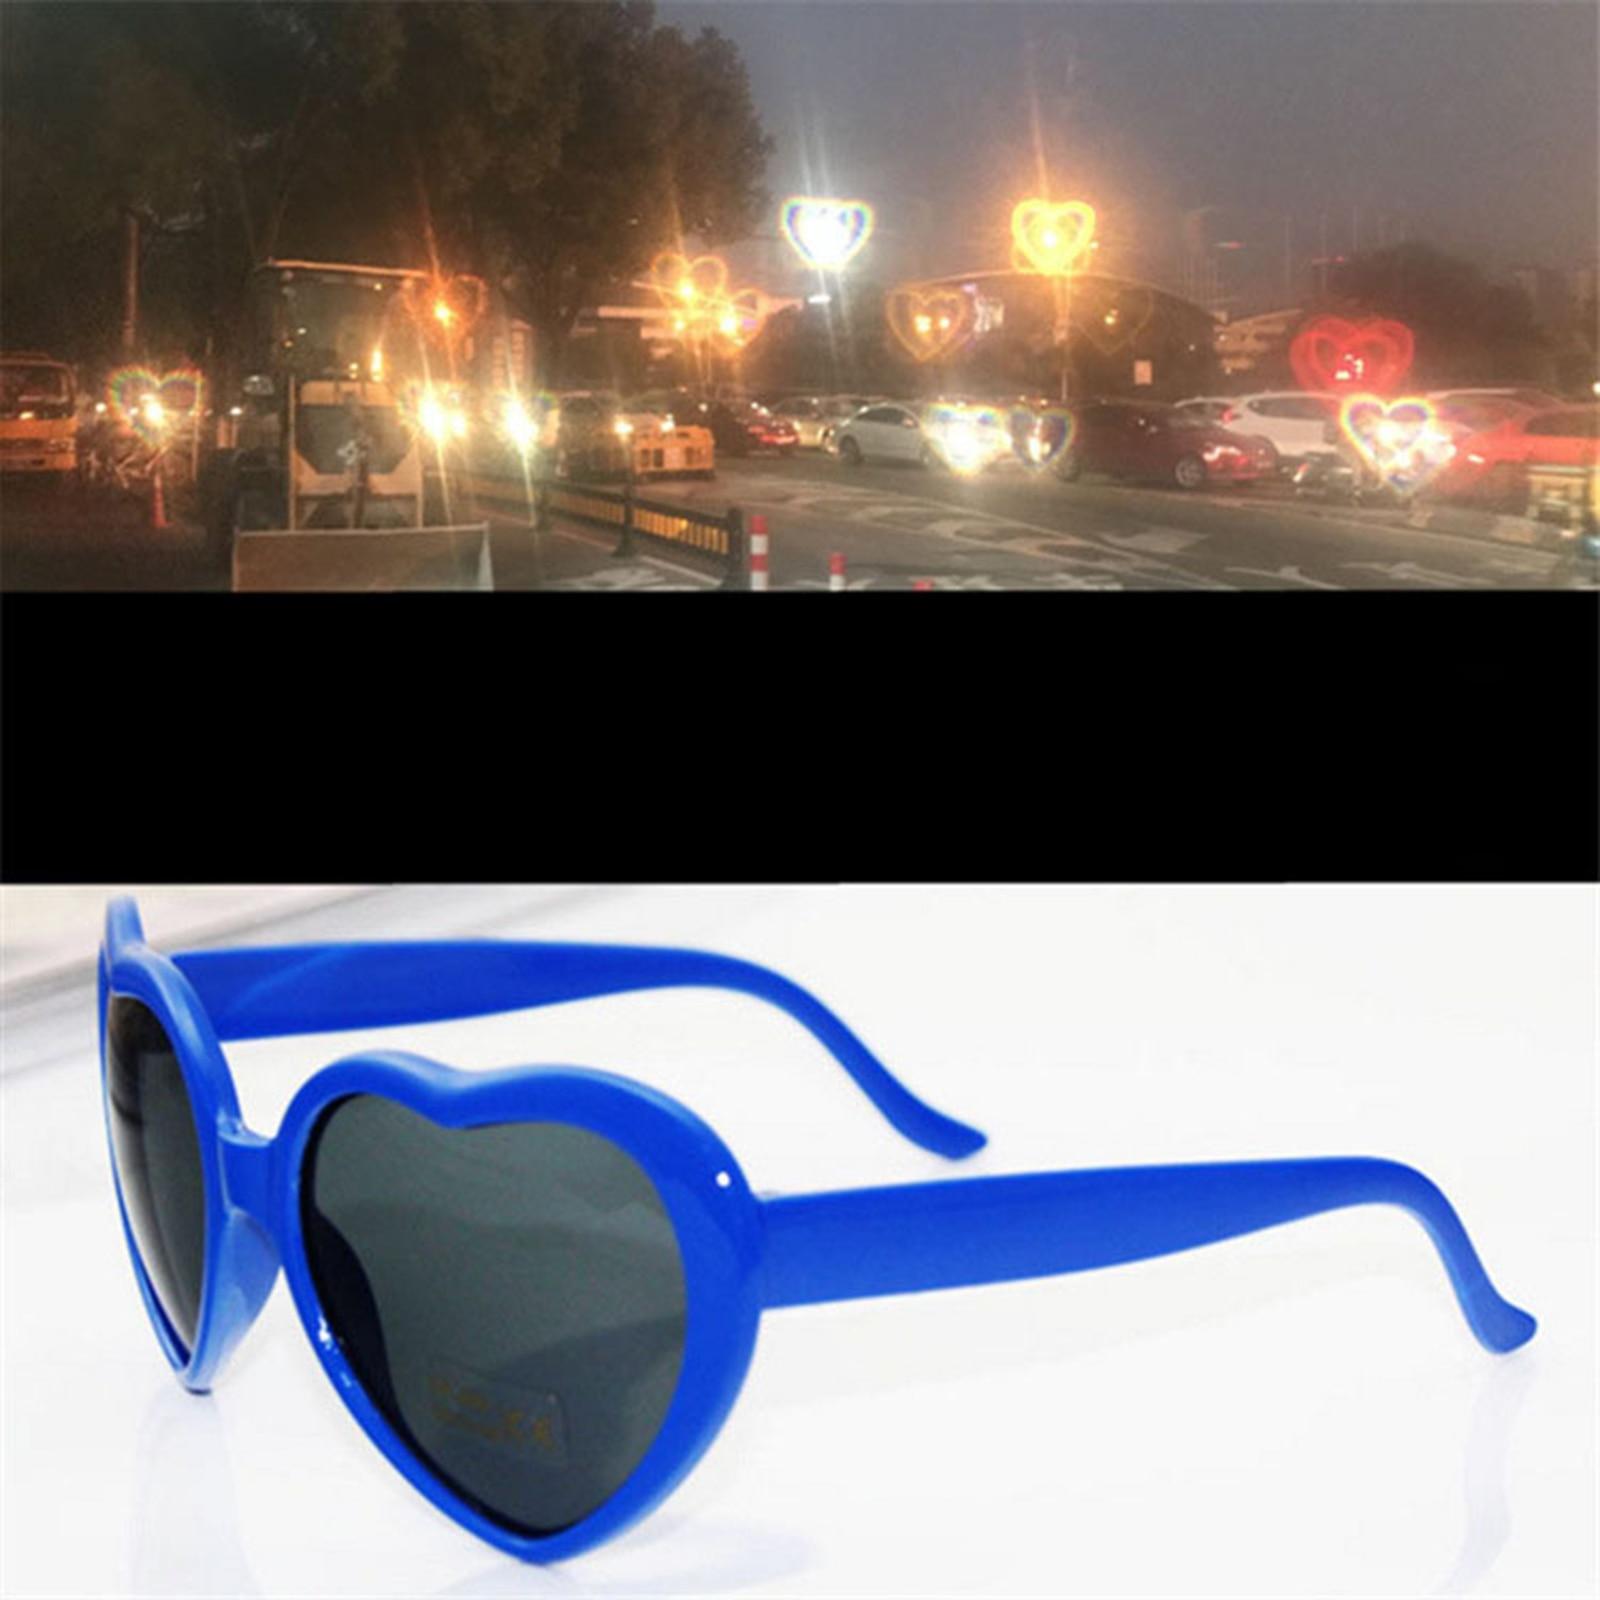 Red Love Heart Shaped Glasses Sunglasses For Women Man Vintage Cat Eye Style Retro Glasses Heart Effect Diffraction Glasses